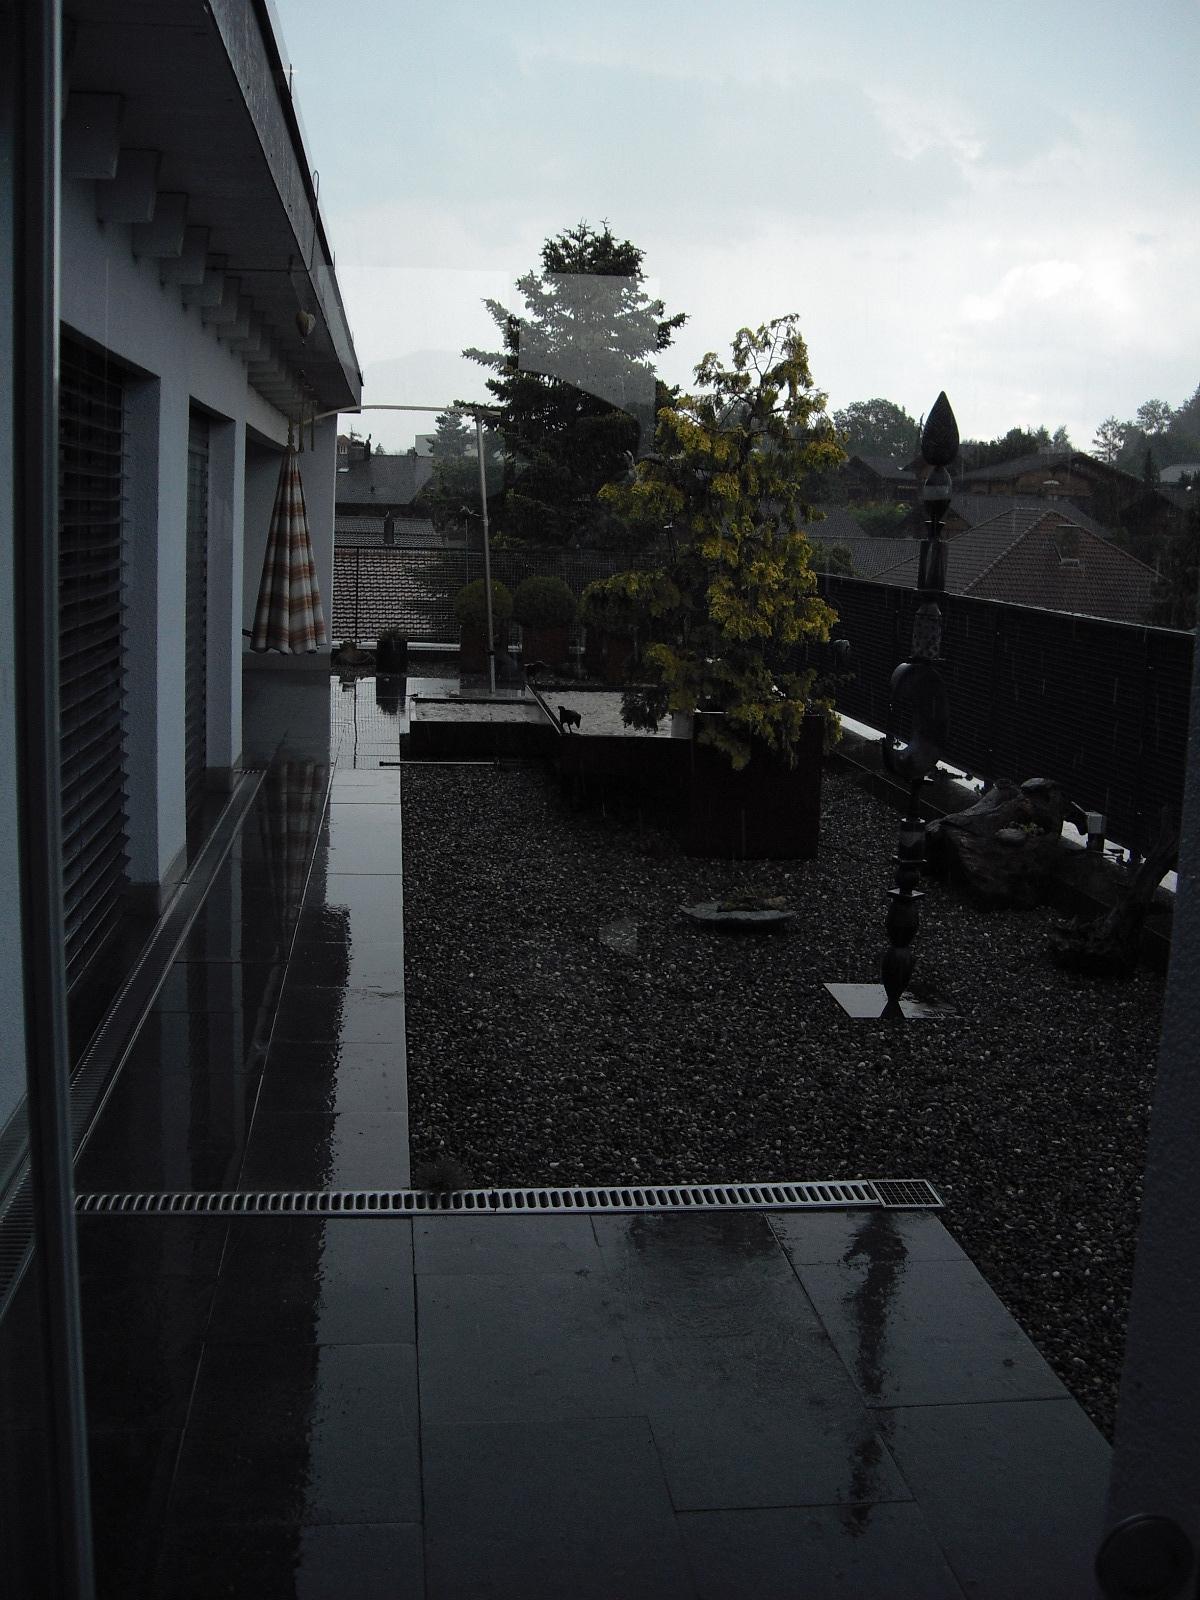 Juli / Willkommener Regen ... 4